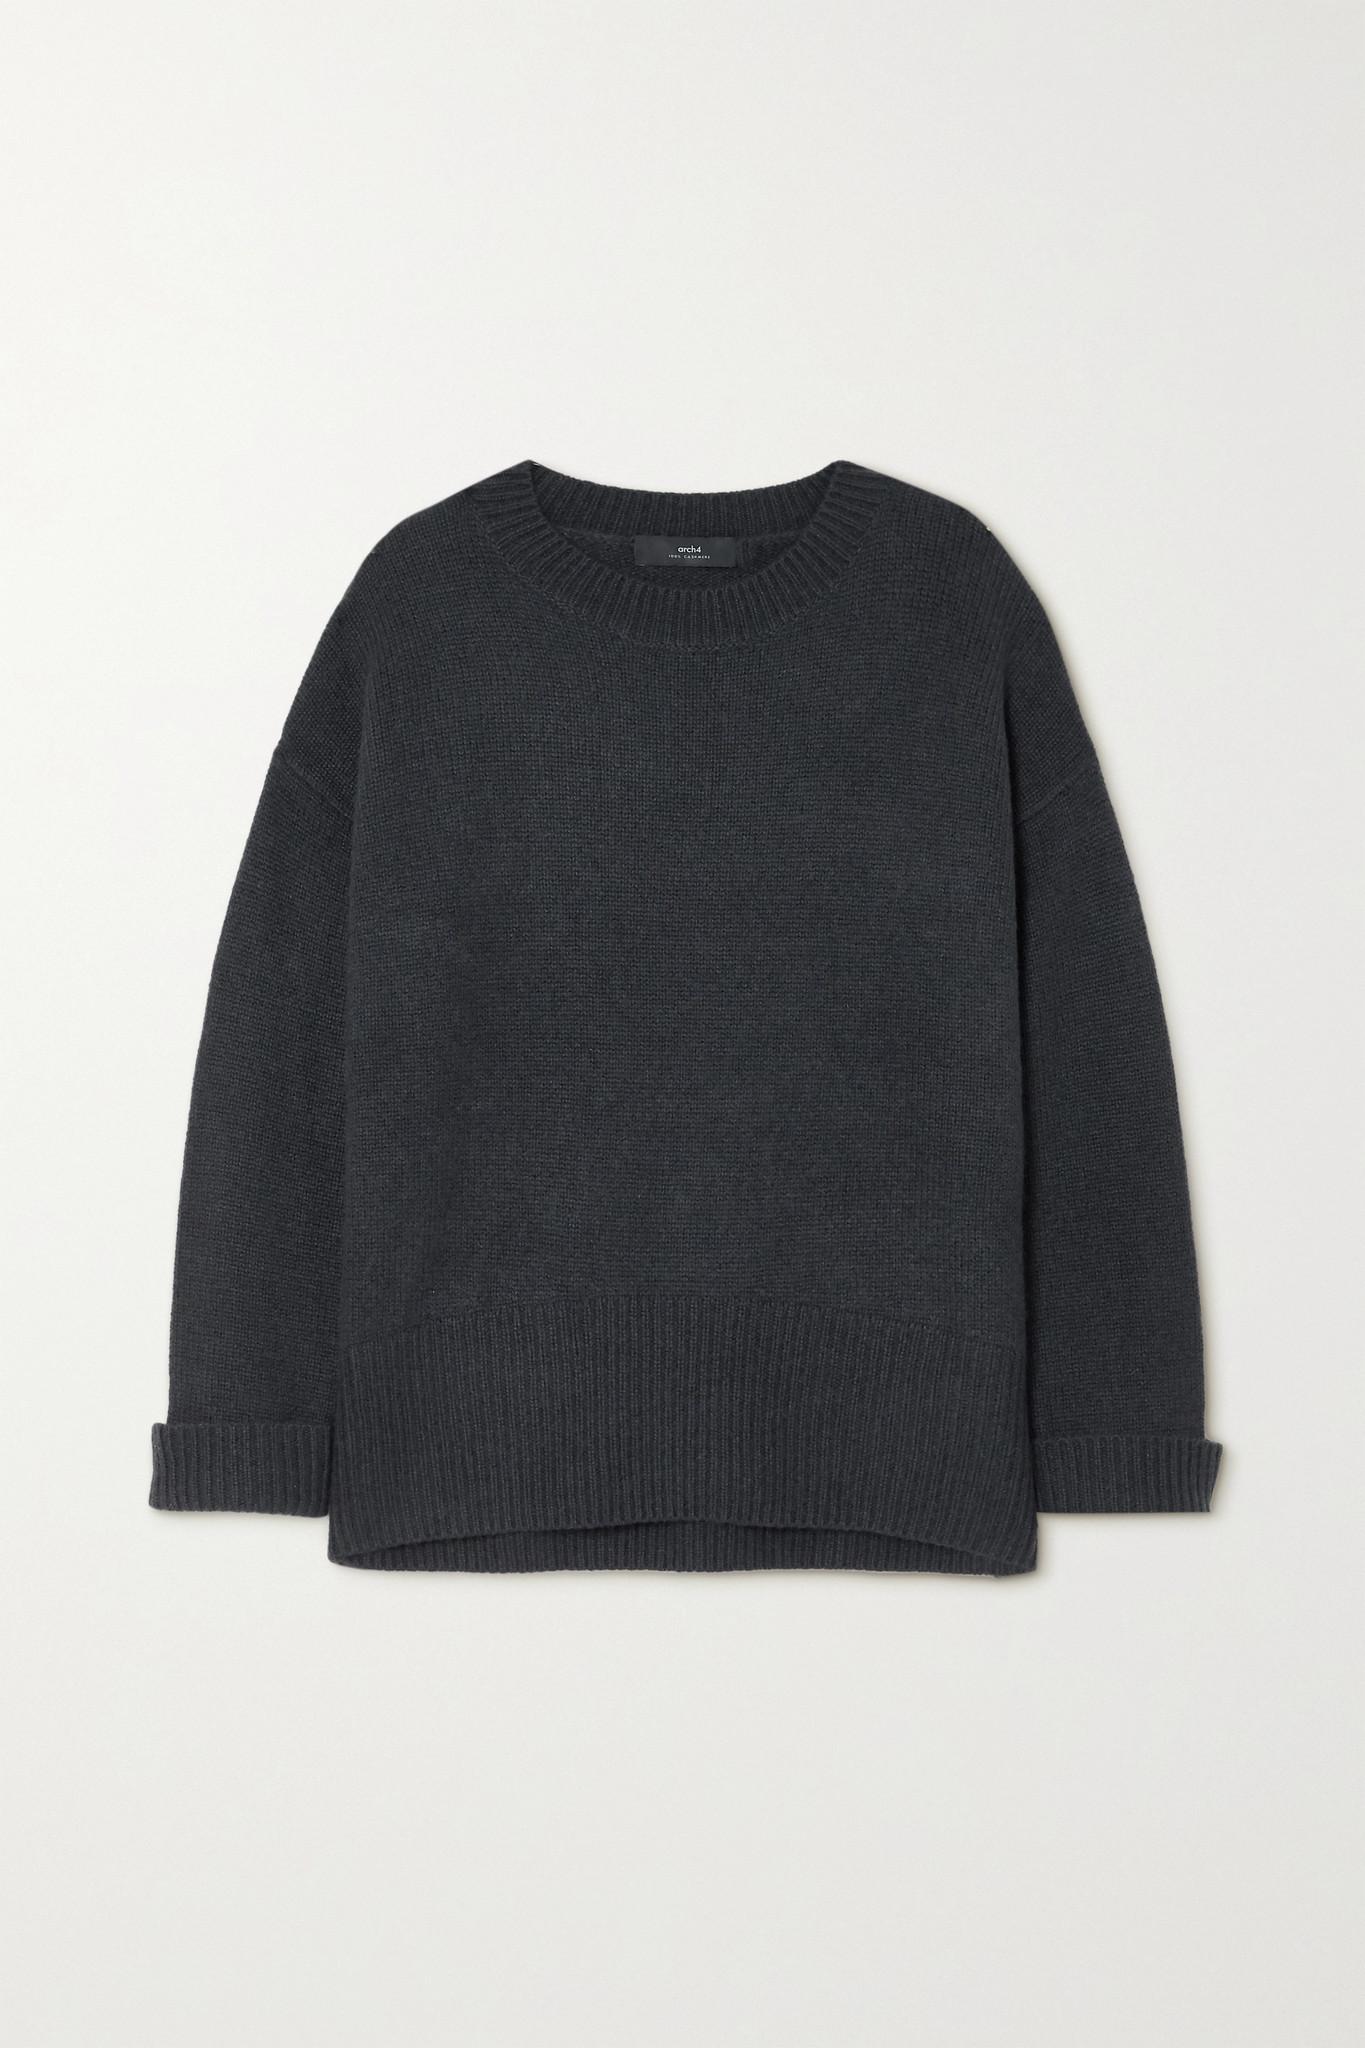 ARCH4 - Knightsbridge 羊绒毛衣 - 灰色 - One size